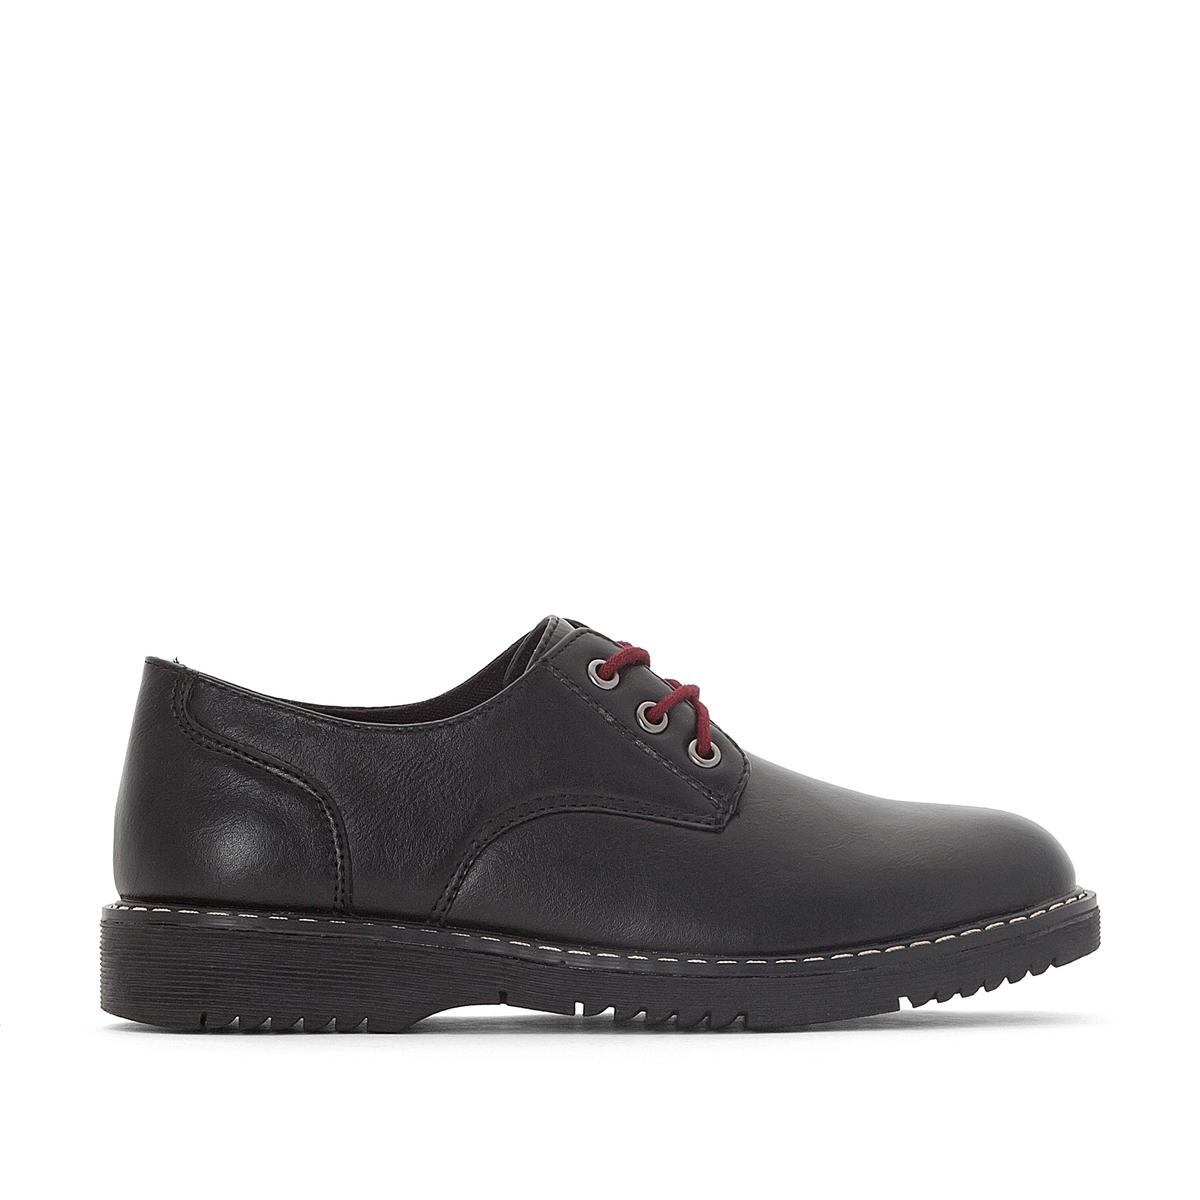 Ботинки-дерби на рифленой подошве, размеры 30-40 ботинки дерби синтетические